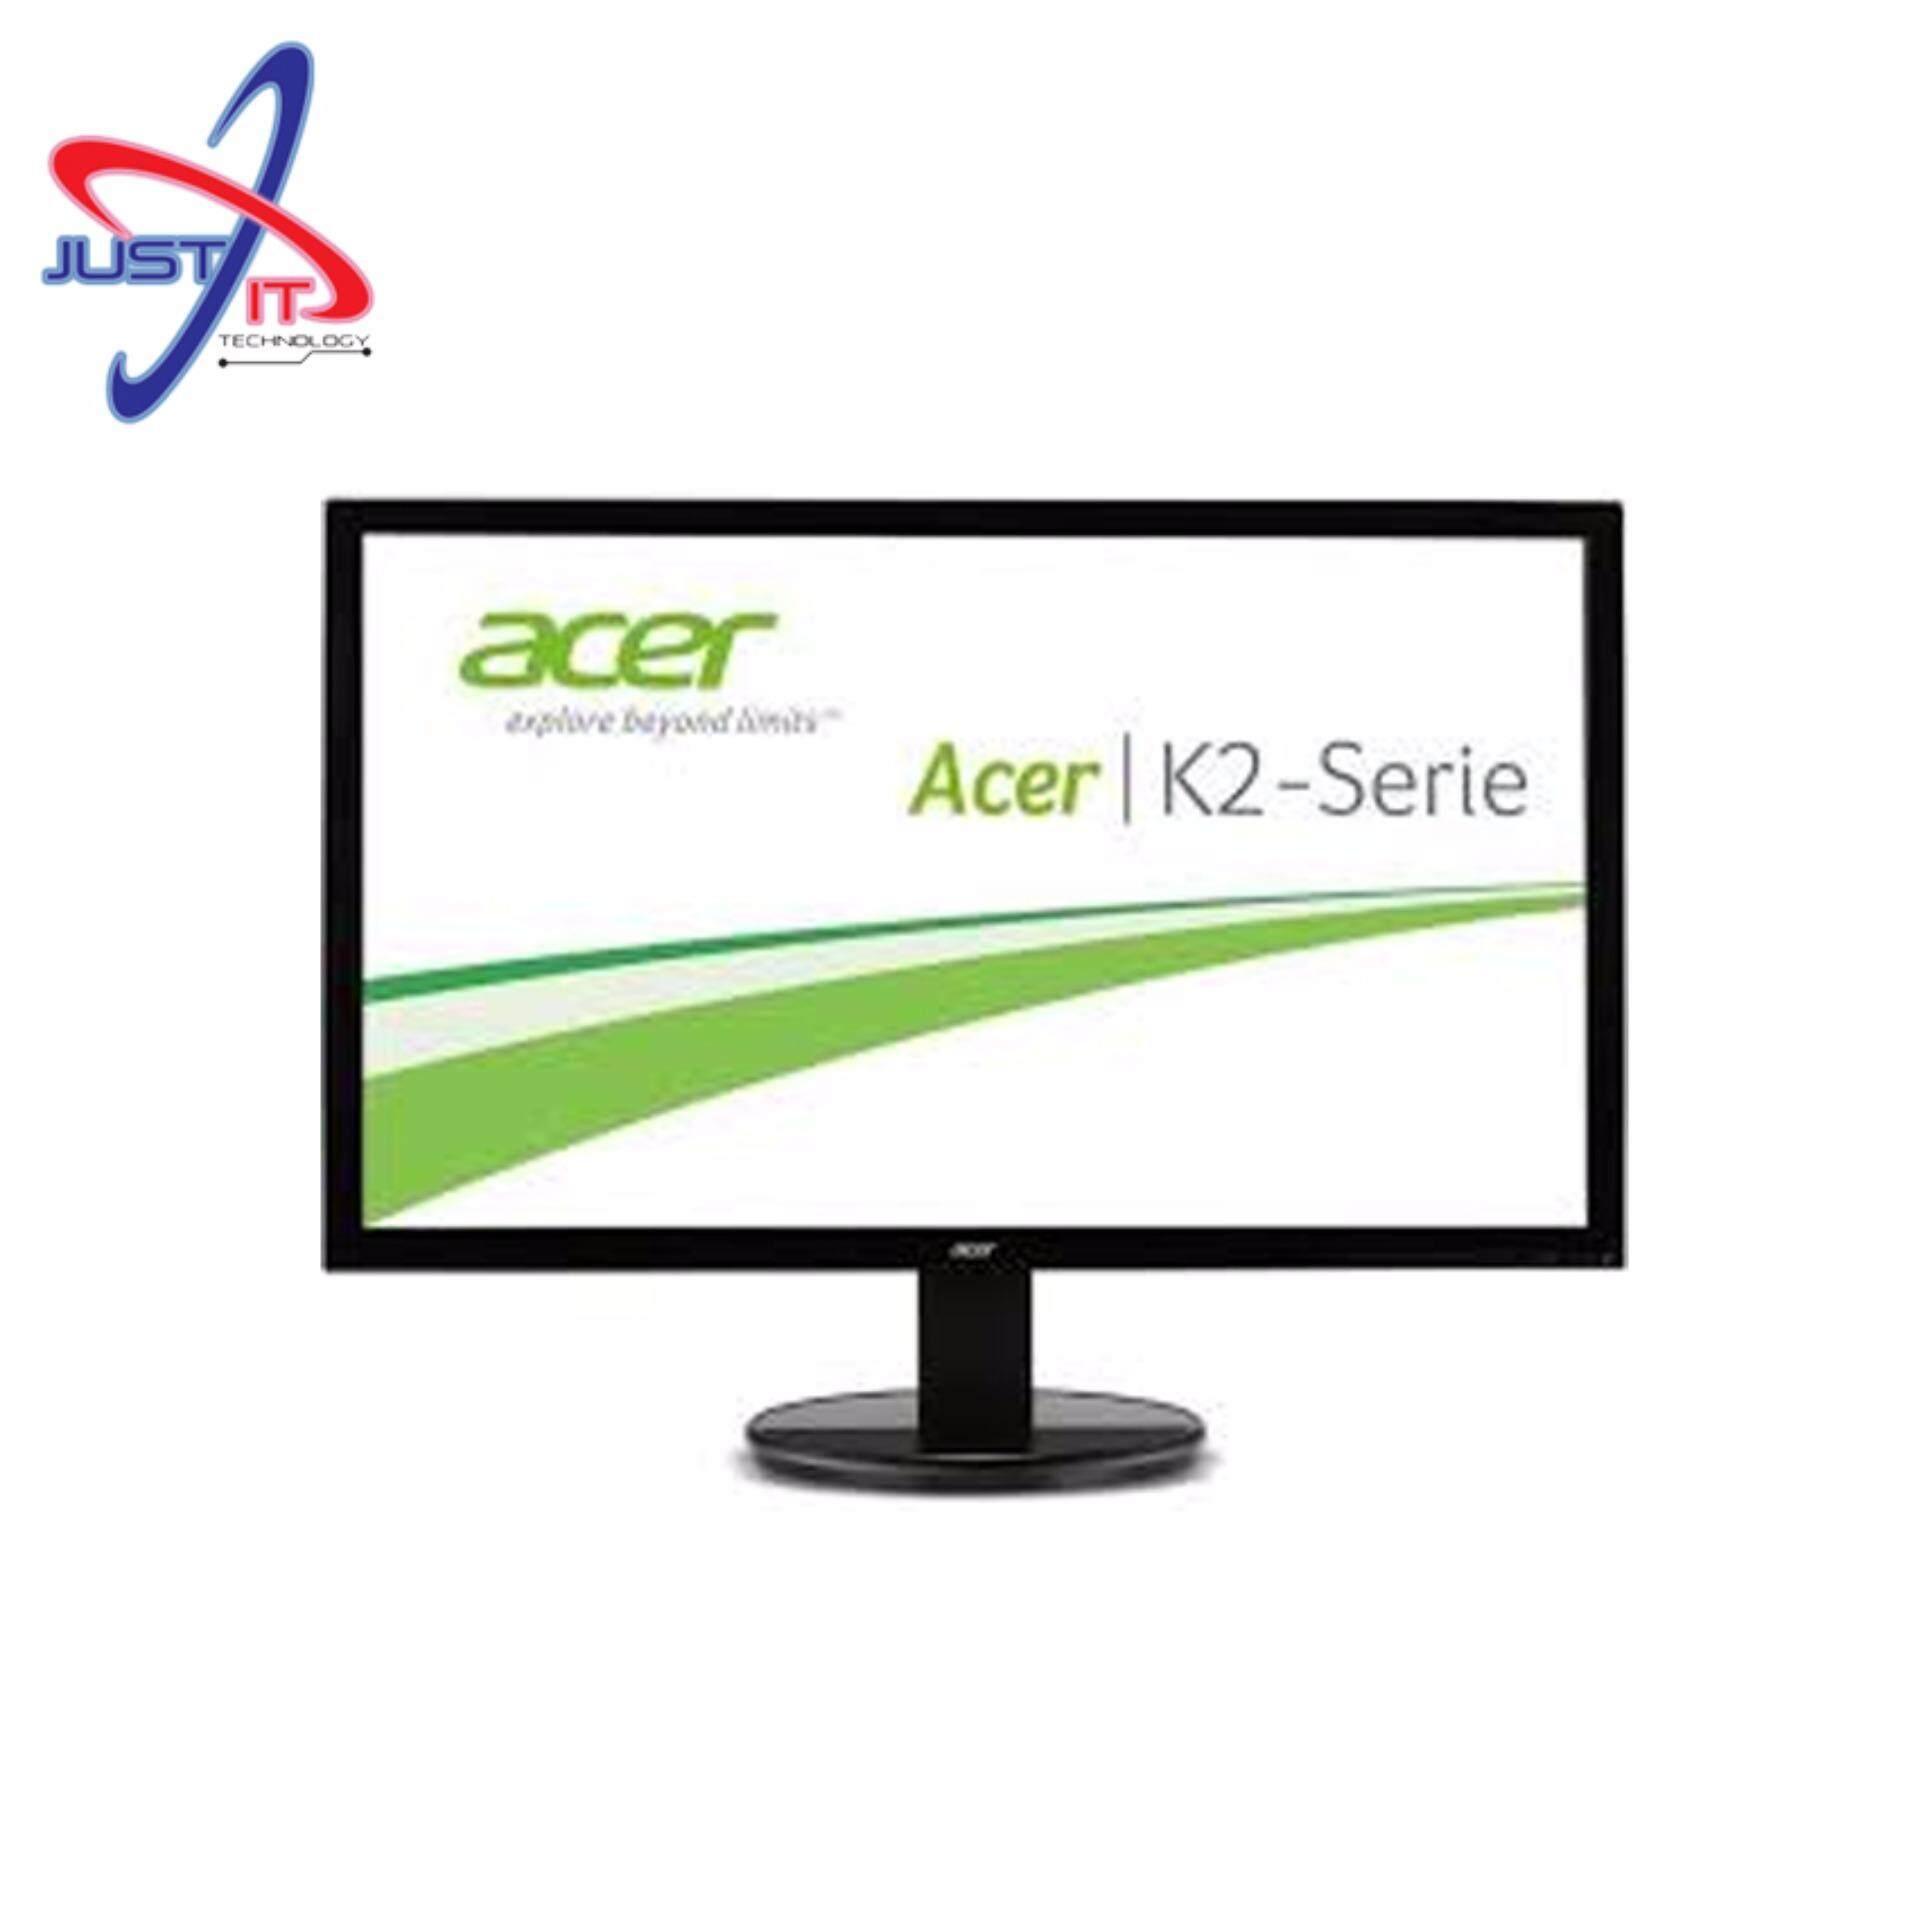 ACER K202HQLA 19.5 LED LCD MONITOR (VGA) Malaysia